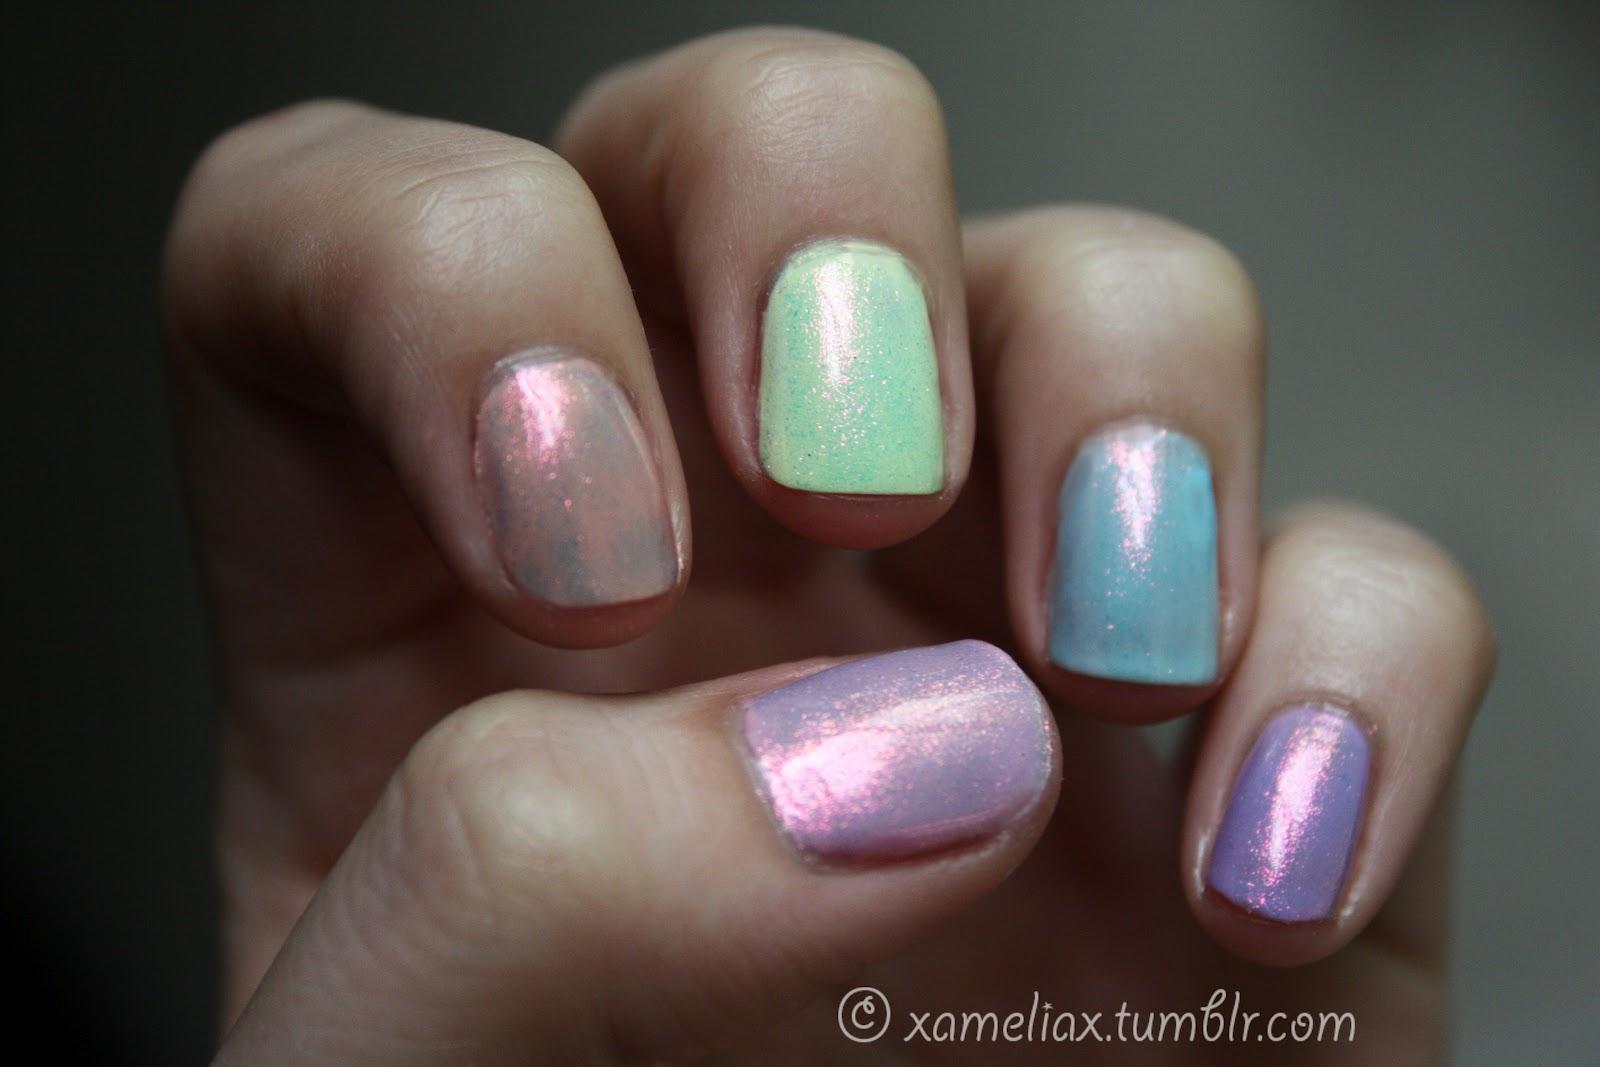 ♥. amelia paints nails .♥.: .Iridescent Pastel Rainbow.